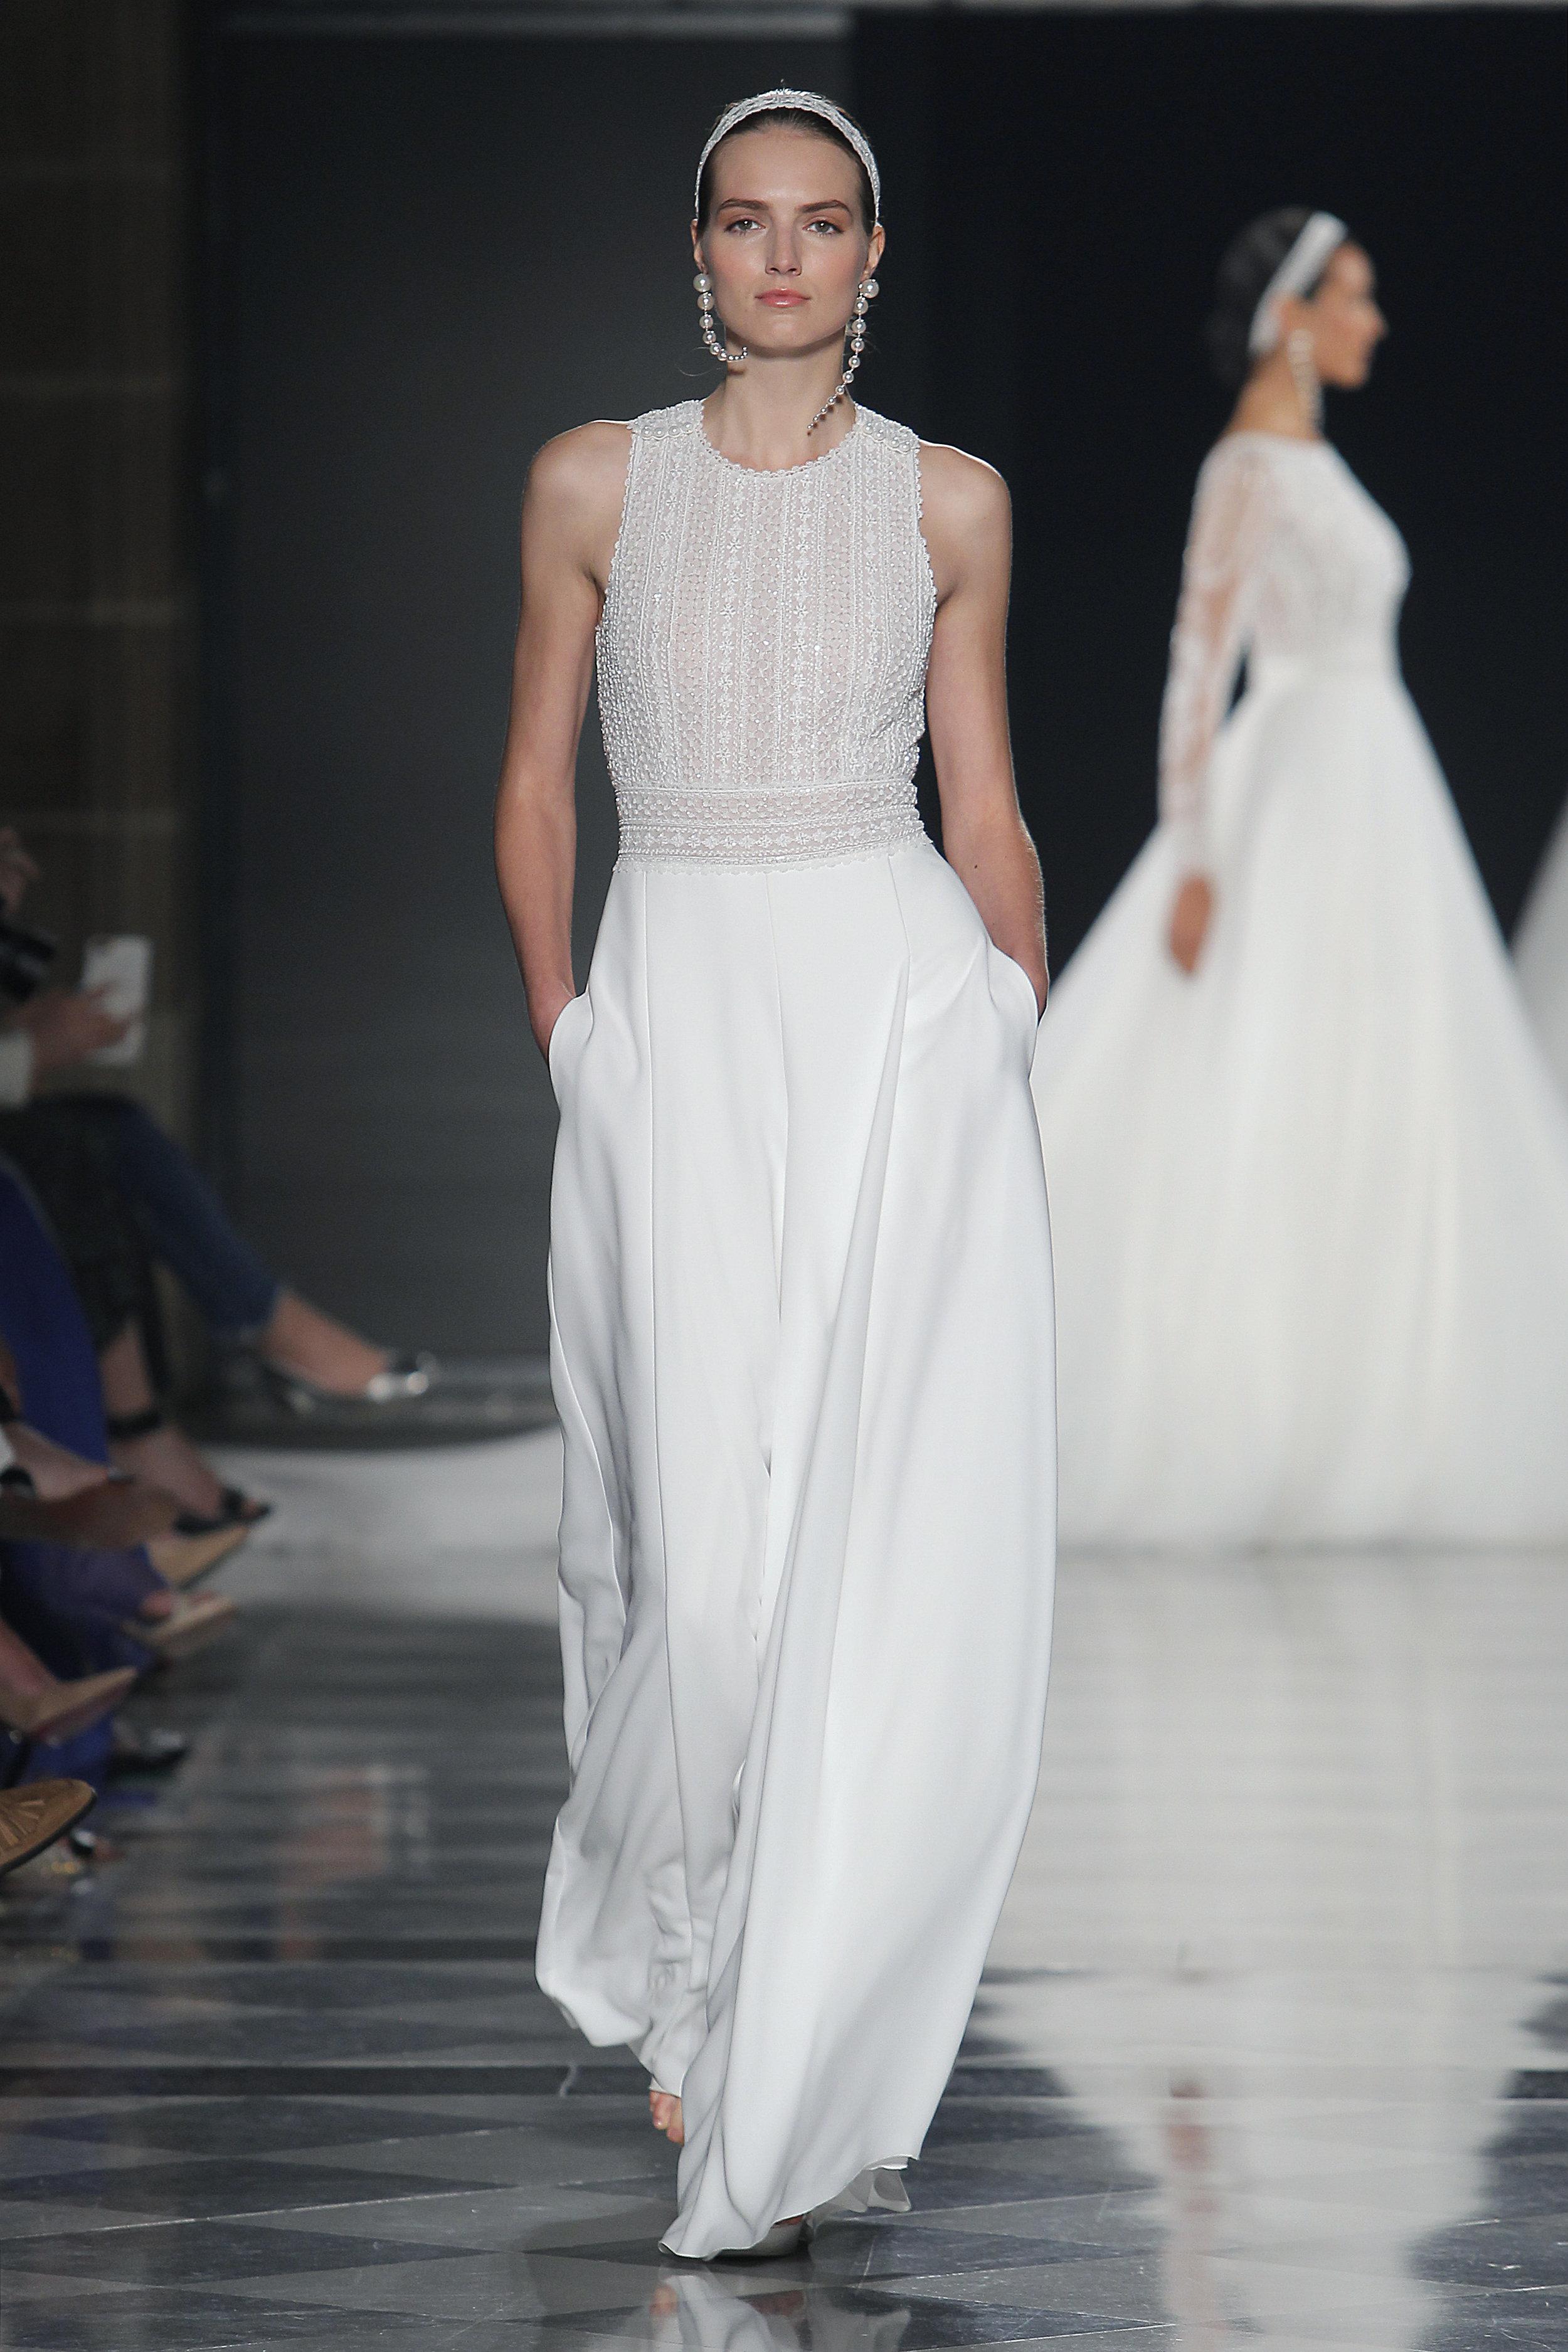 Diseñador: Rosa Clará - Pasarela:   Valmont Barcelona Bridal Fashion Week